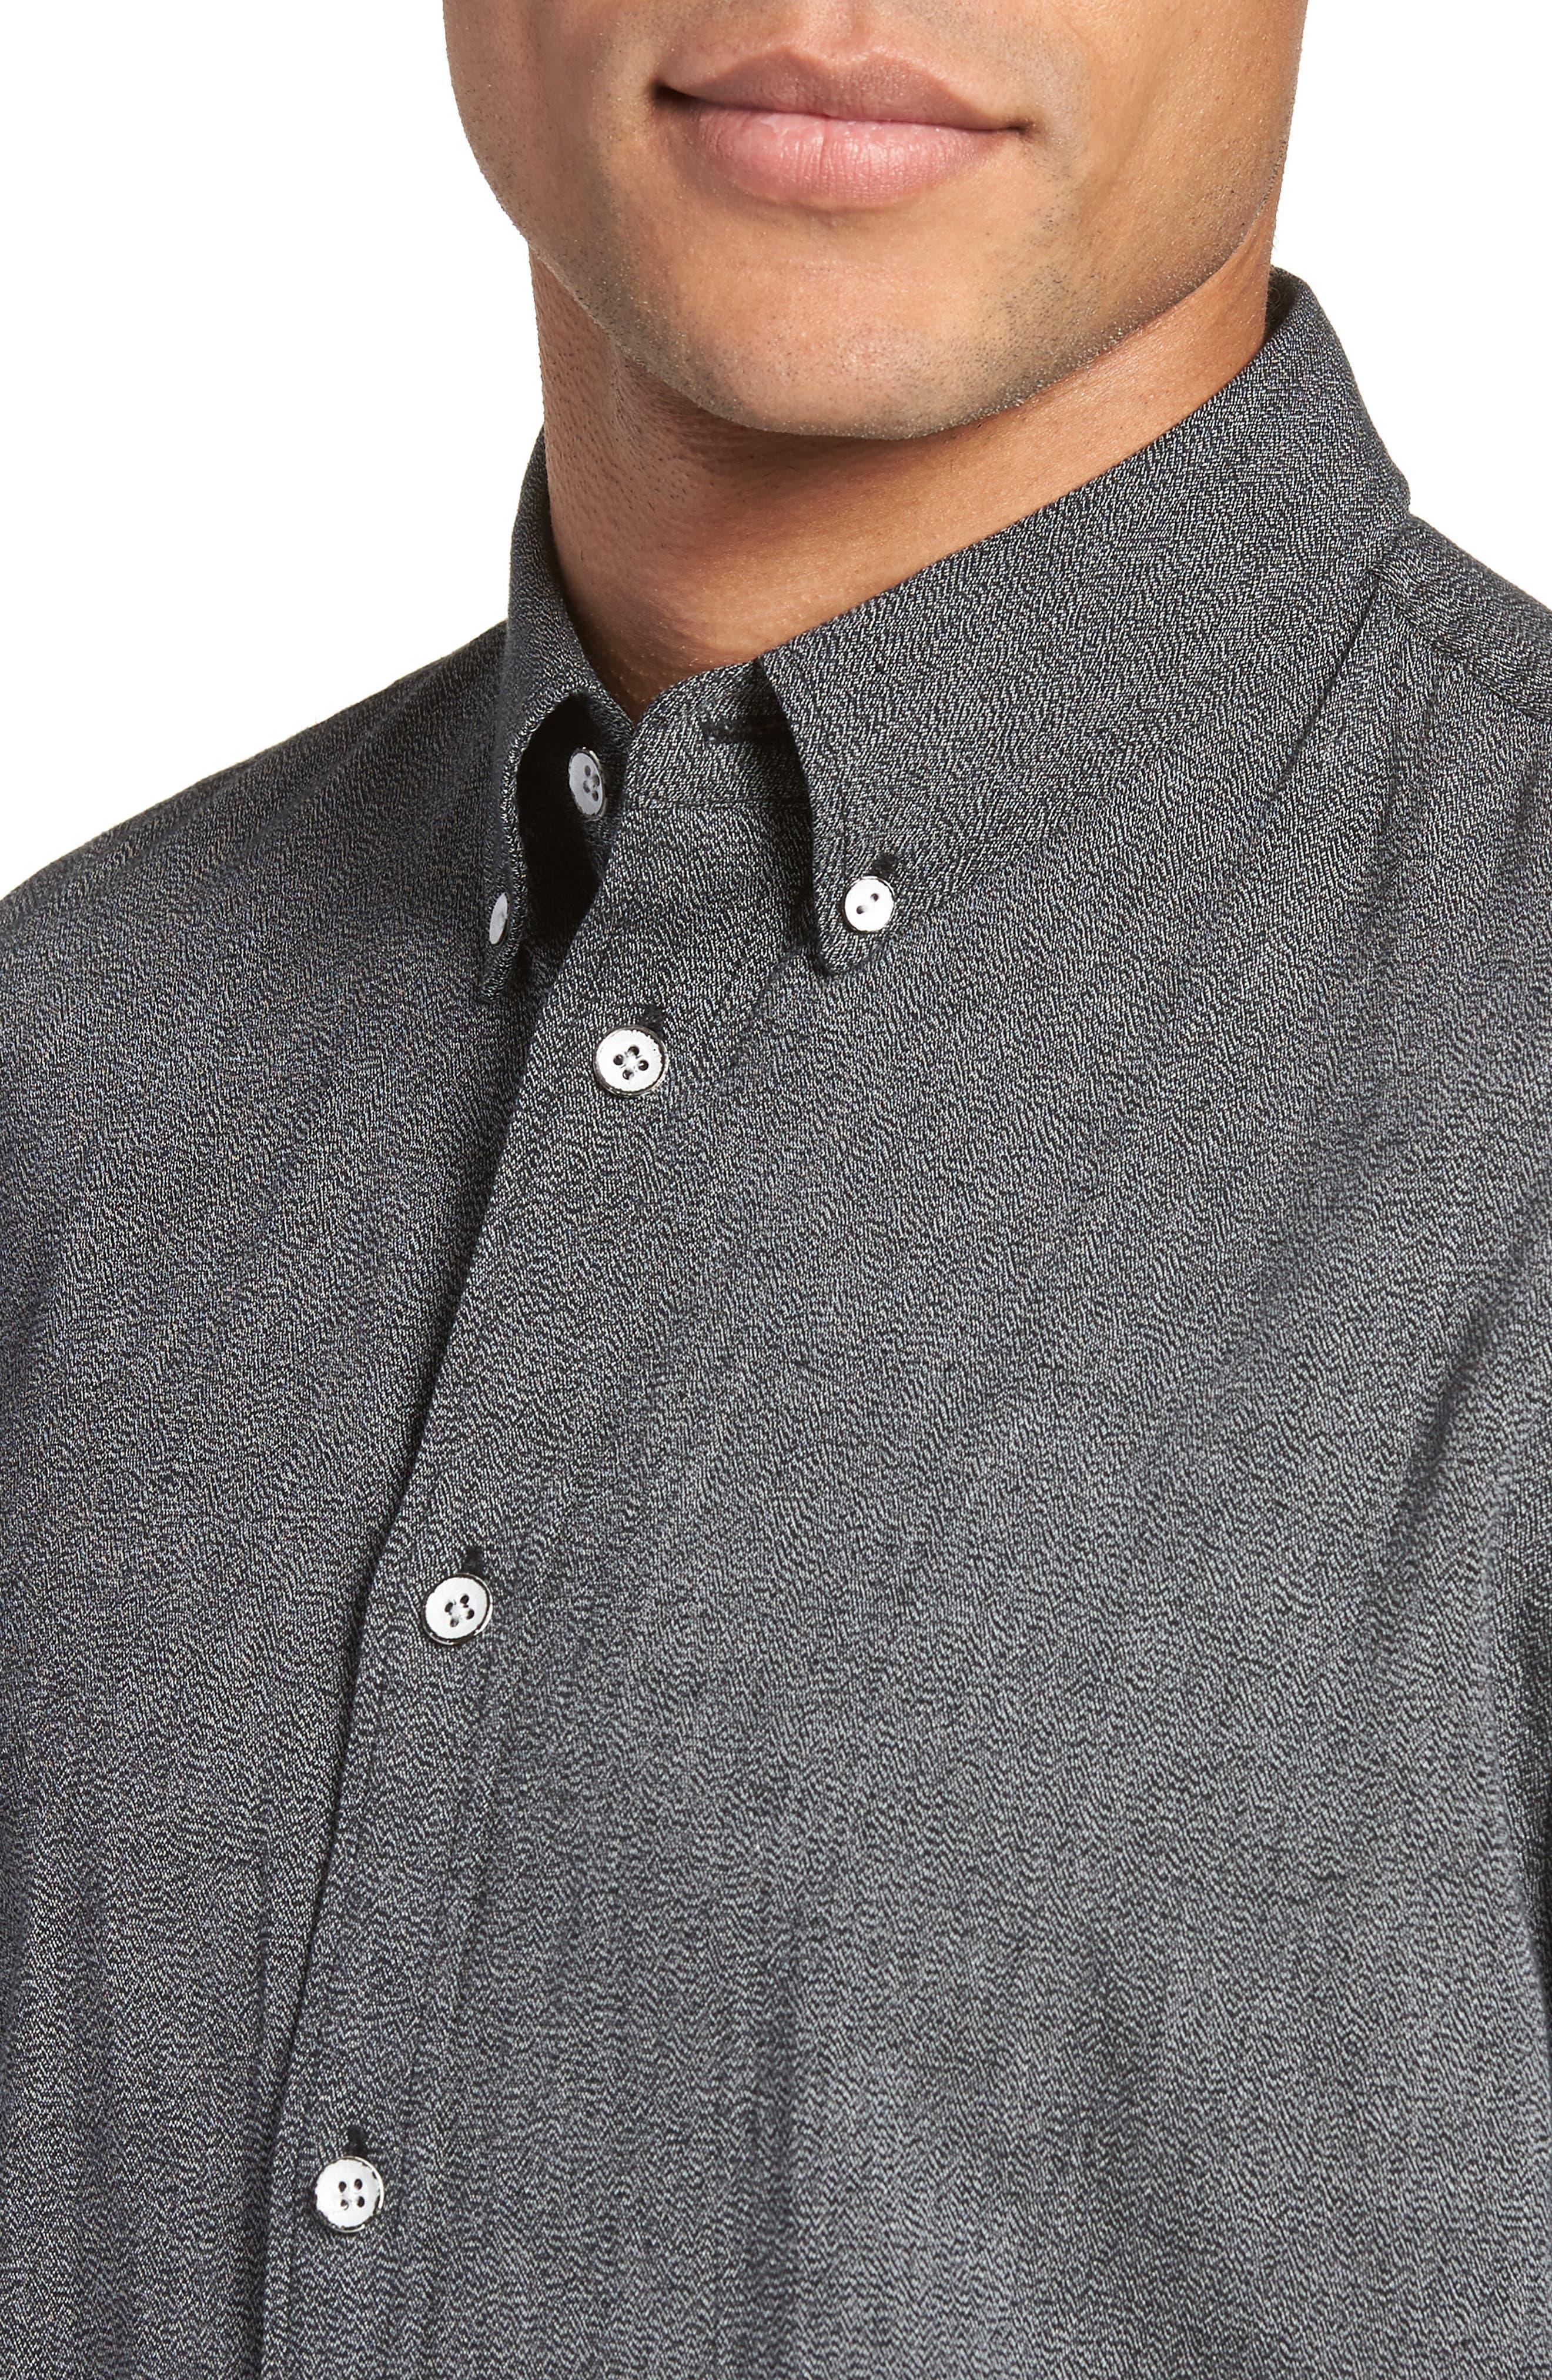 RAG & BONE,                             Tomlin Slim Fit Sport Shirt,                             Alternate thumbnail 4, color,                             020